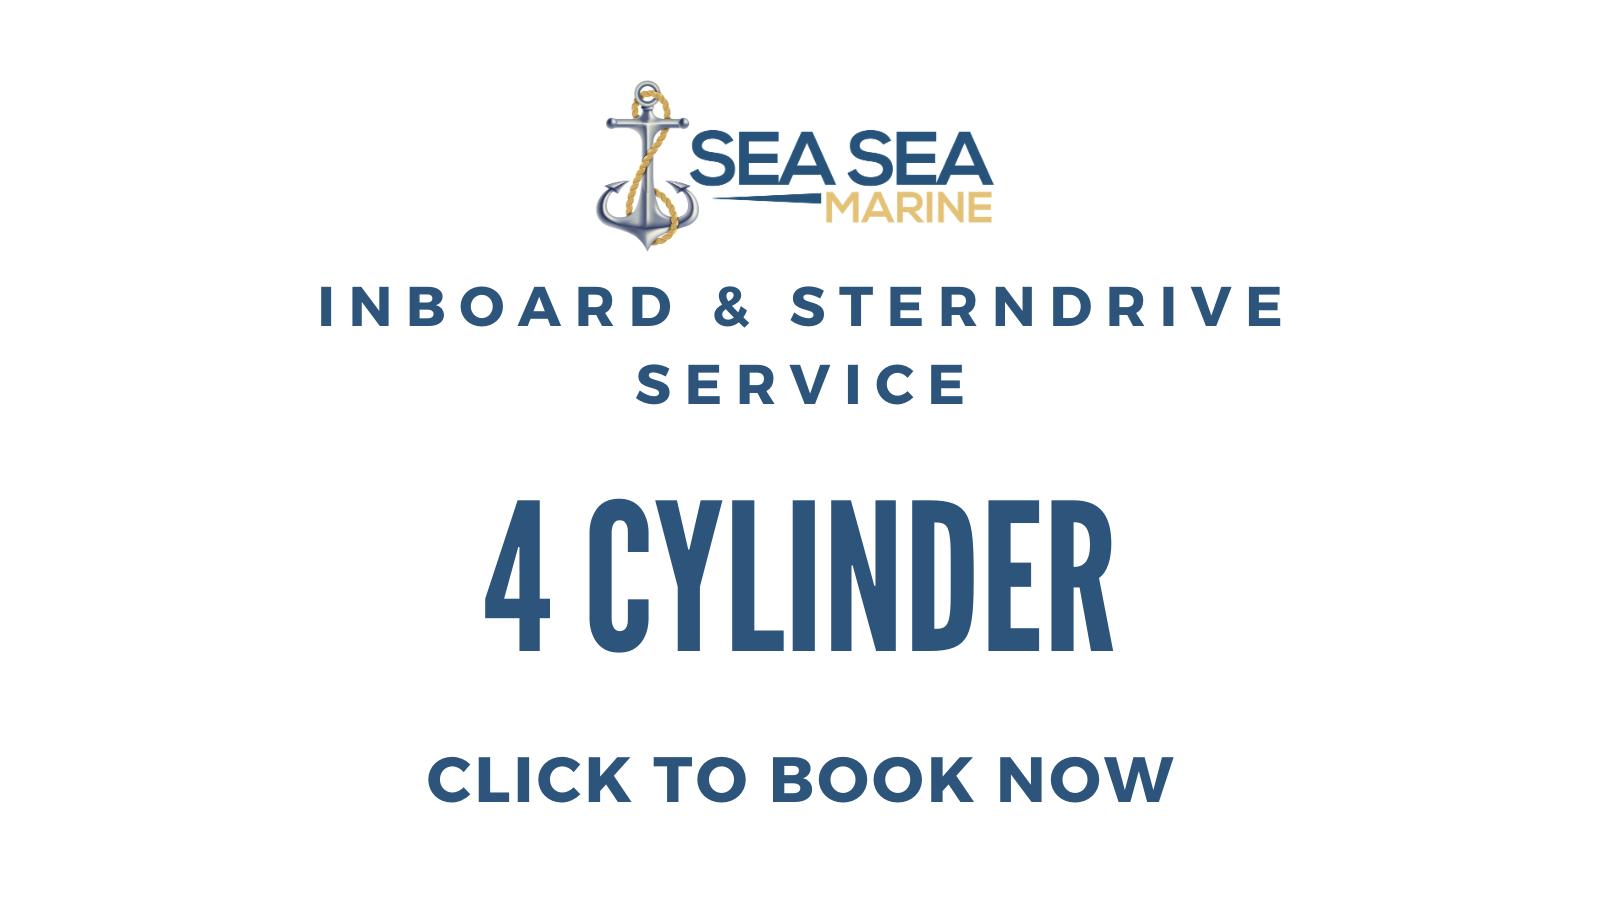 Inboard/Sterndrive Service (4 Cylinder)